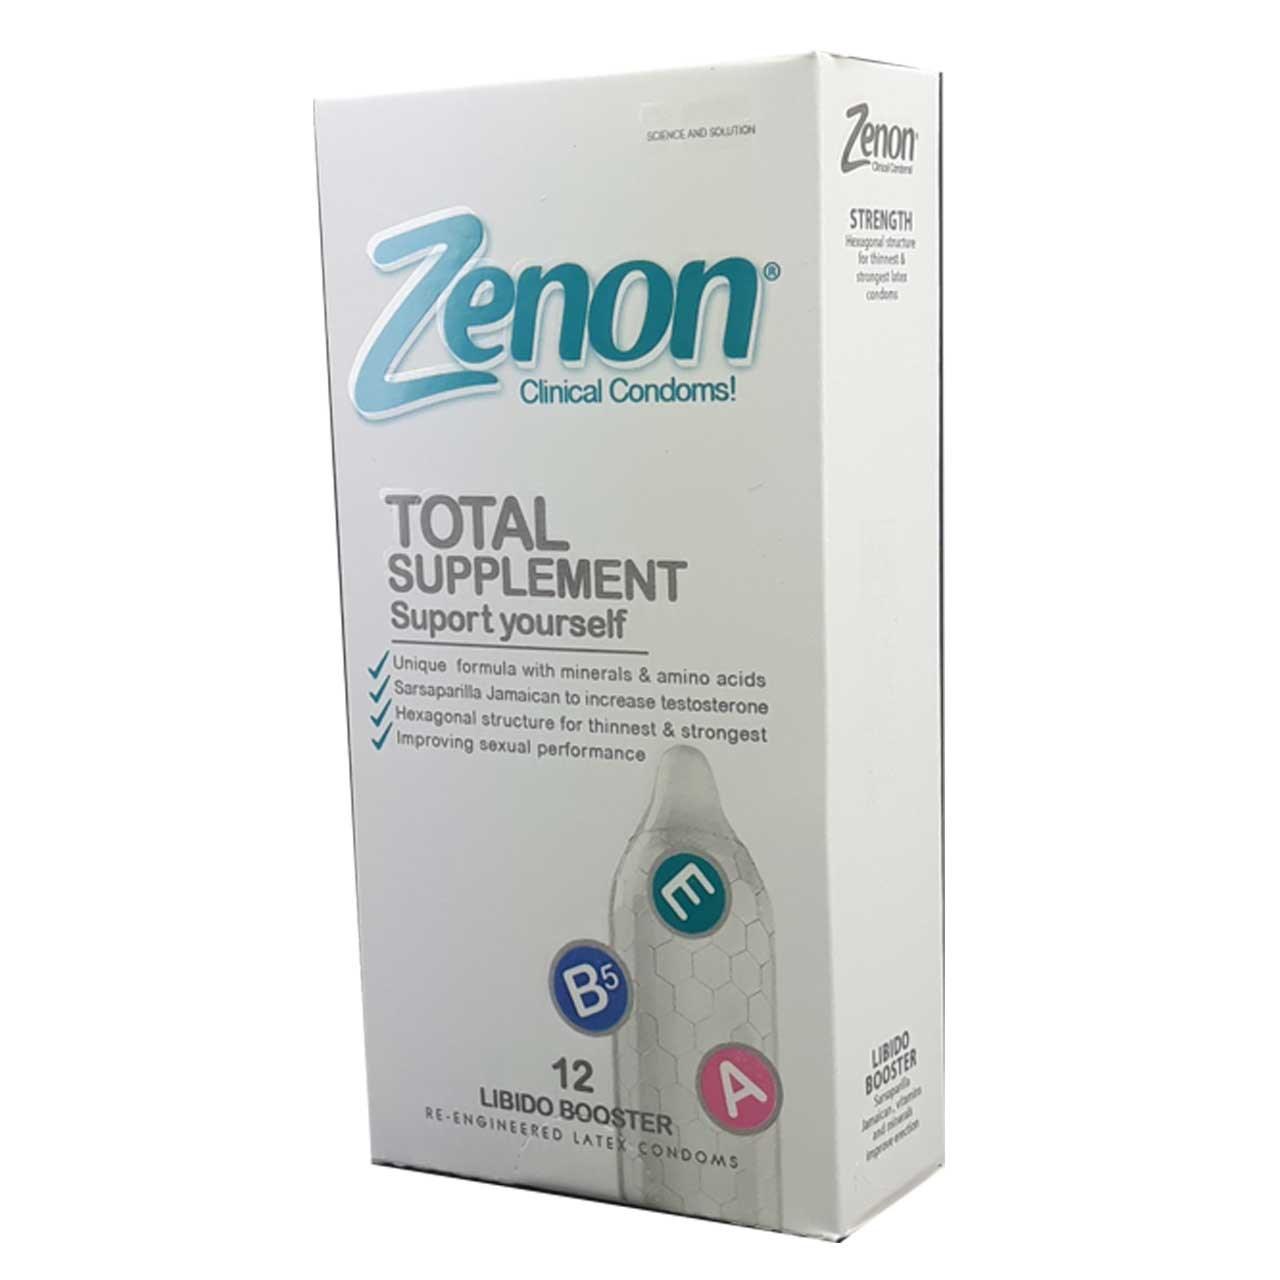 کاندوم زنون مدل Total Suplement بسته 12 عددی